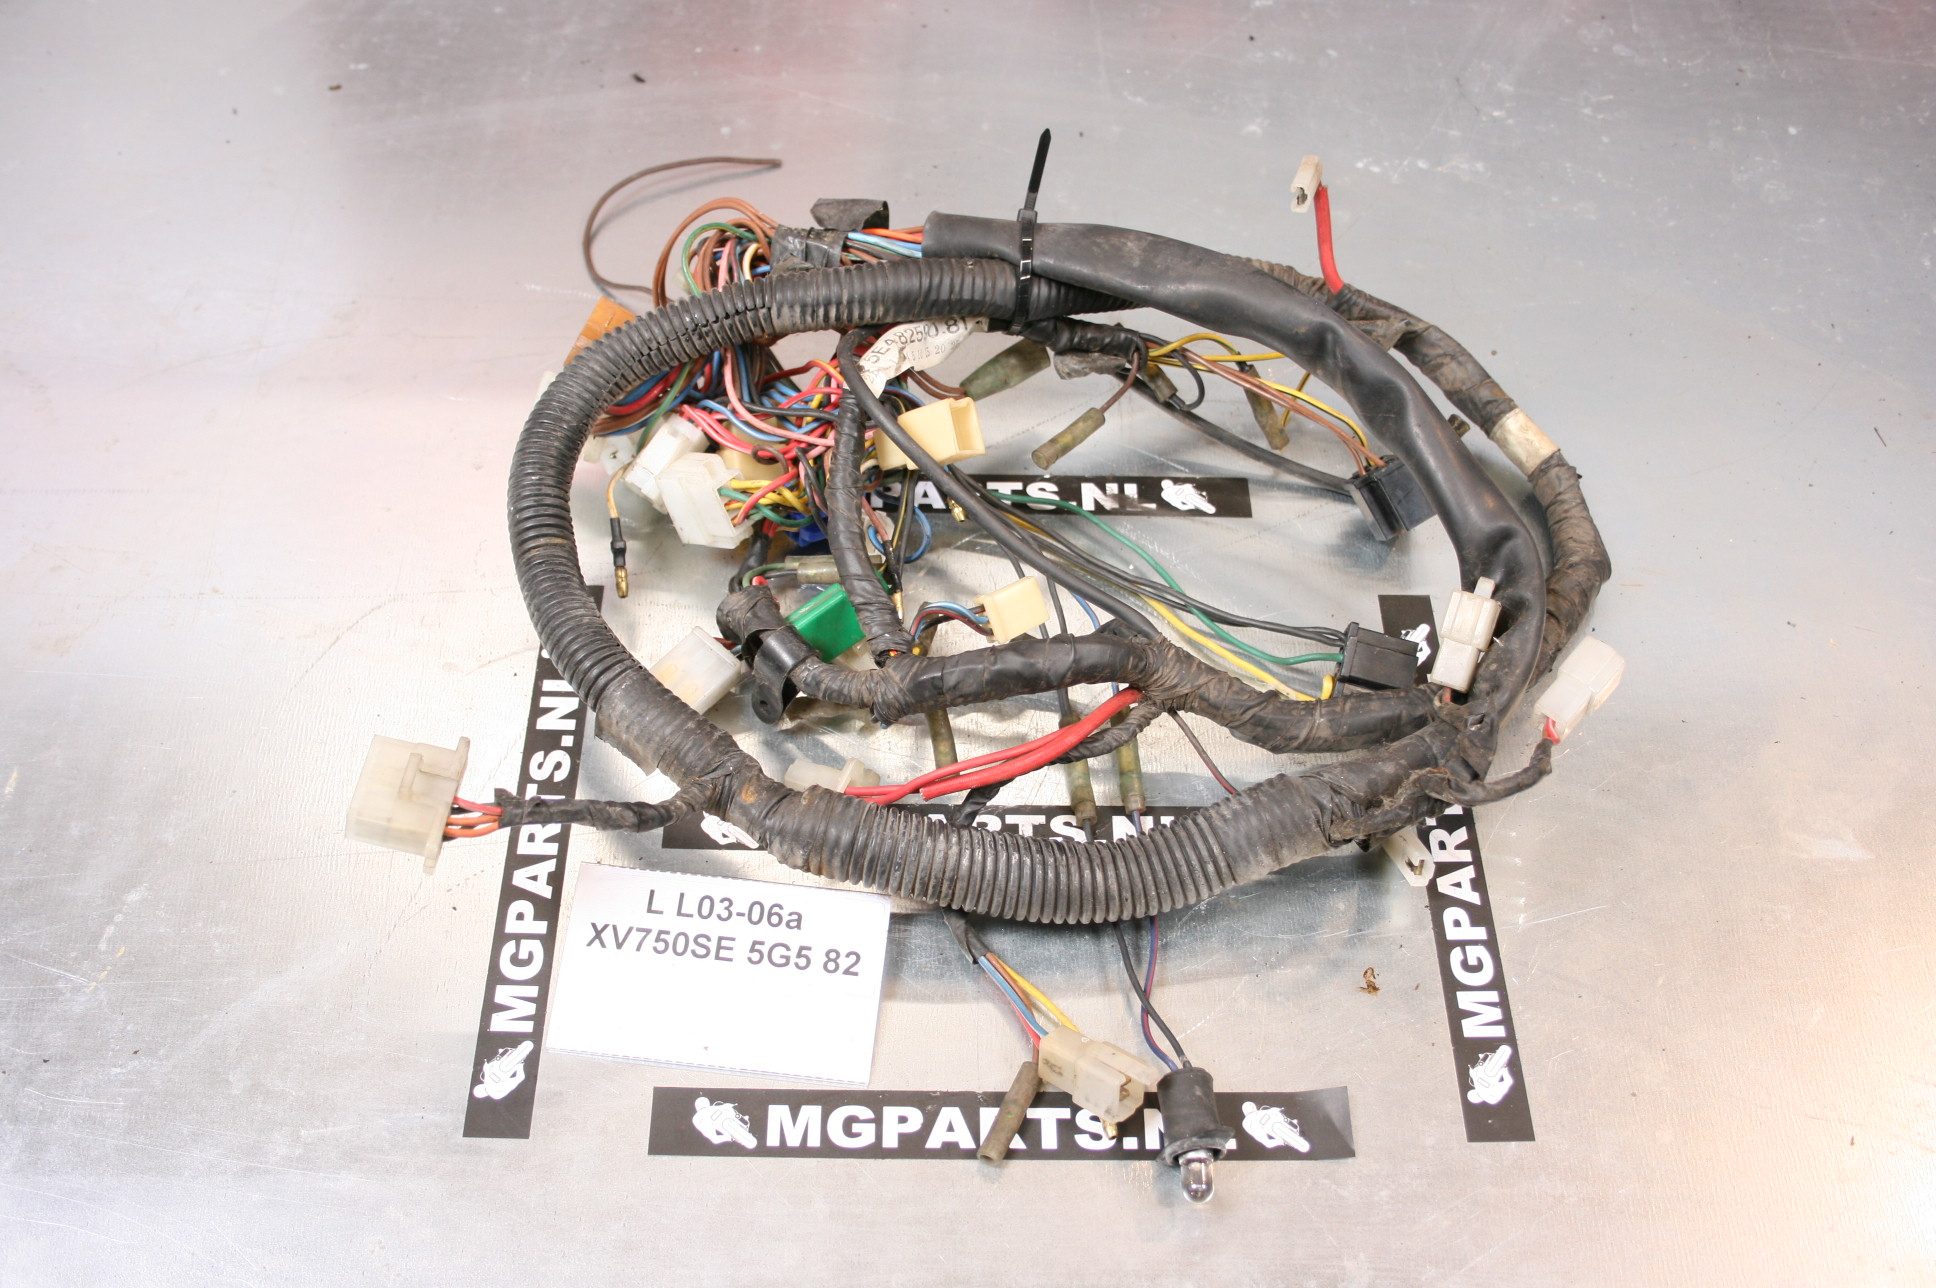 Yamaha Xv 750 Se 5g5 81 82 Kabelboom 4x7 82590 51 Wire Harness Virago Wiring Mg Parts